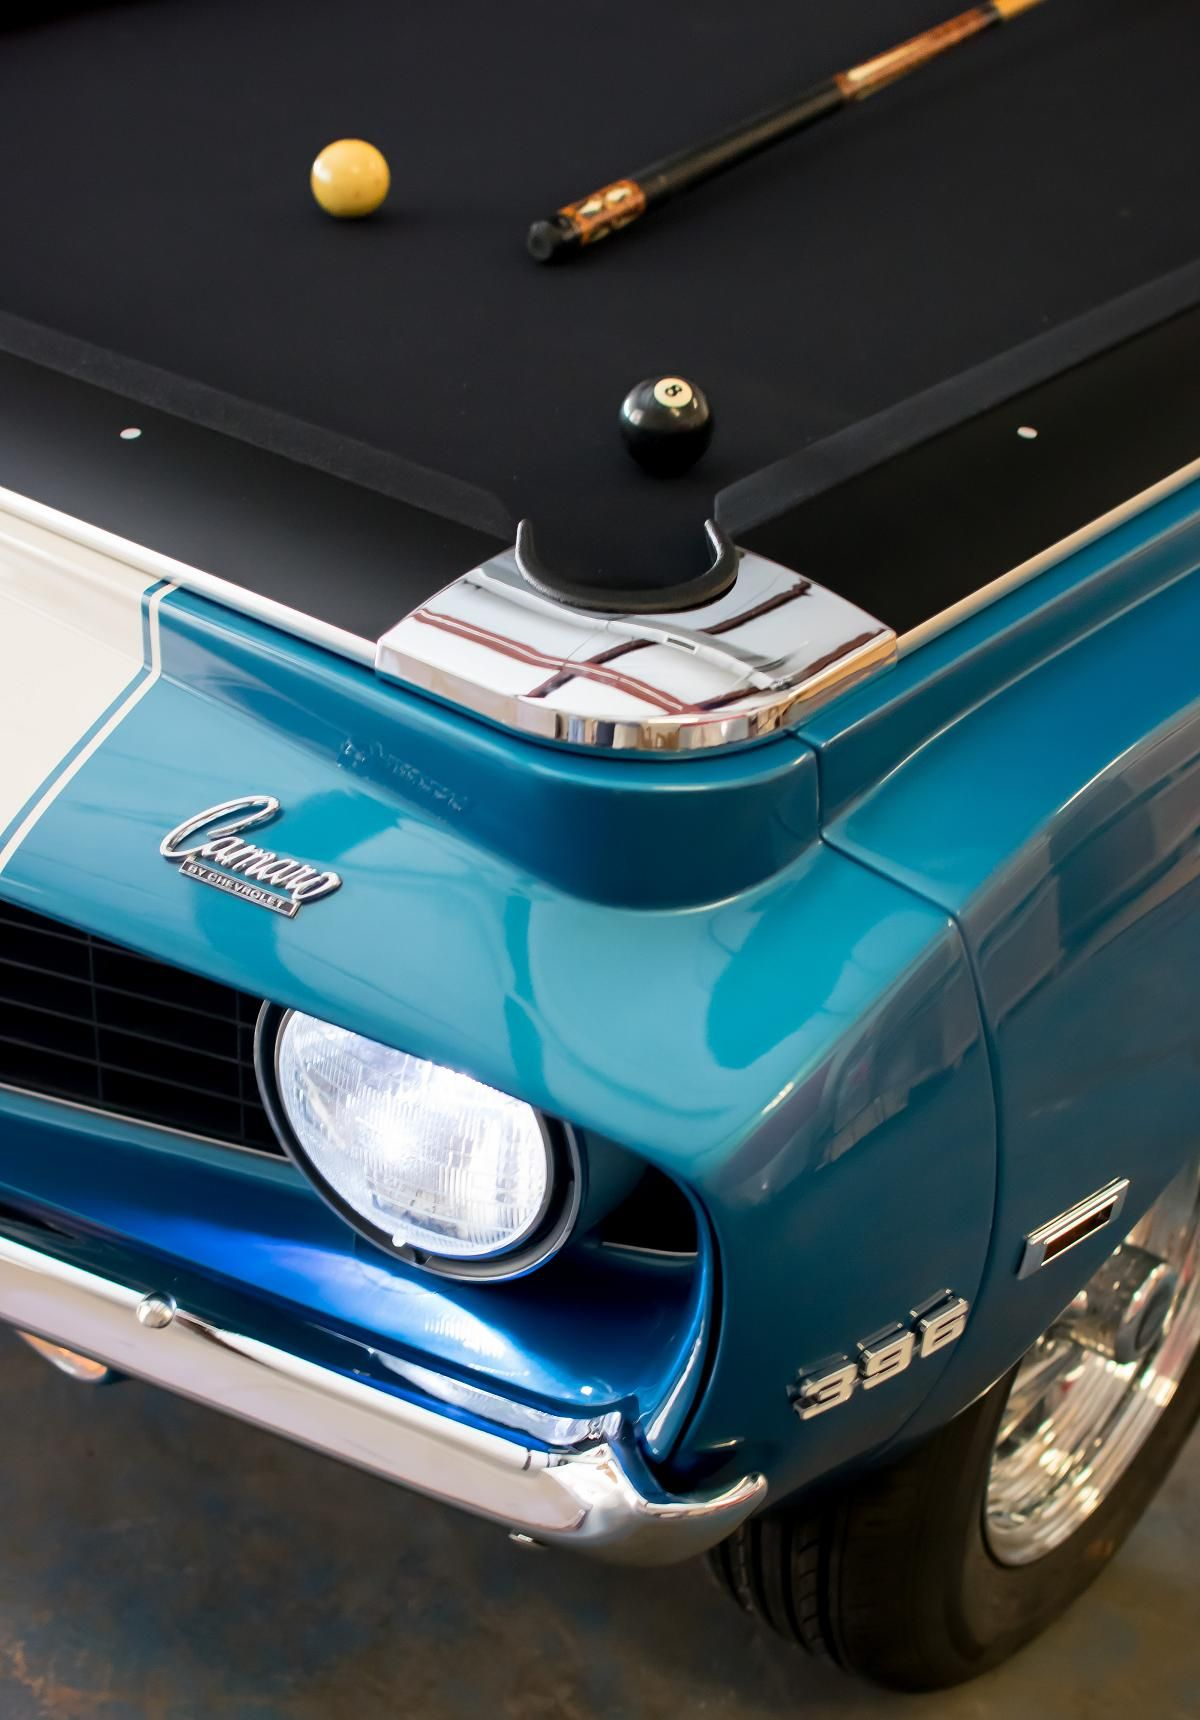 Camaro SS Pool Table By WwwCarPoolTablescom Car Pool Tables - Car pool table